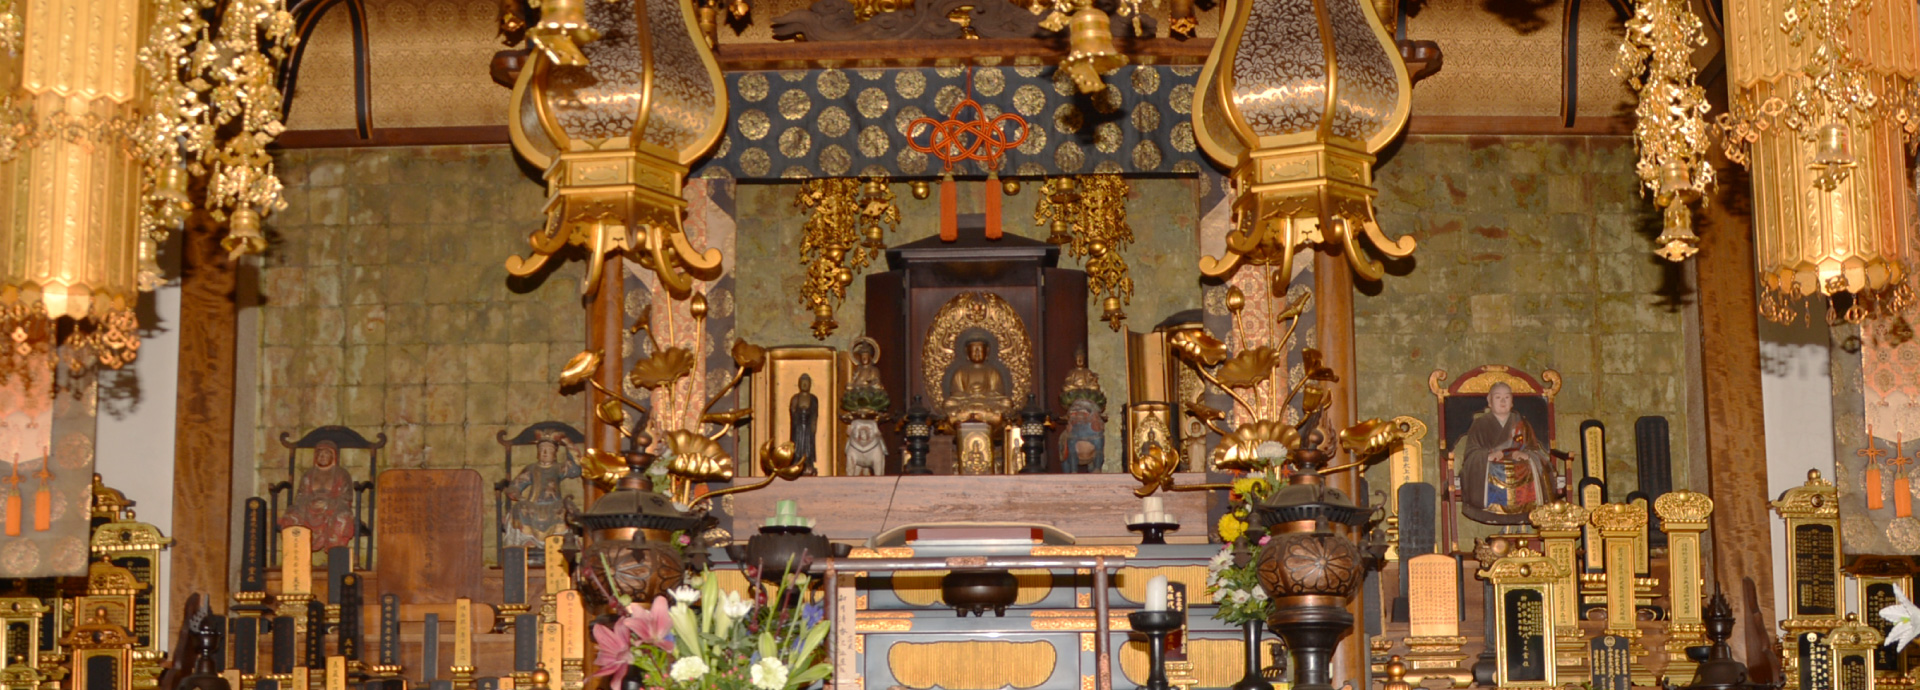 篠原寺の由緒